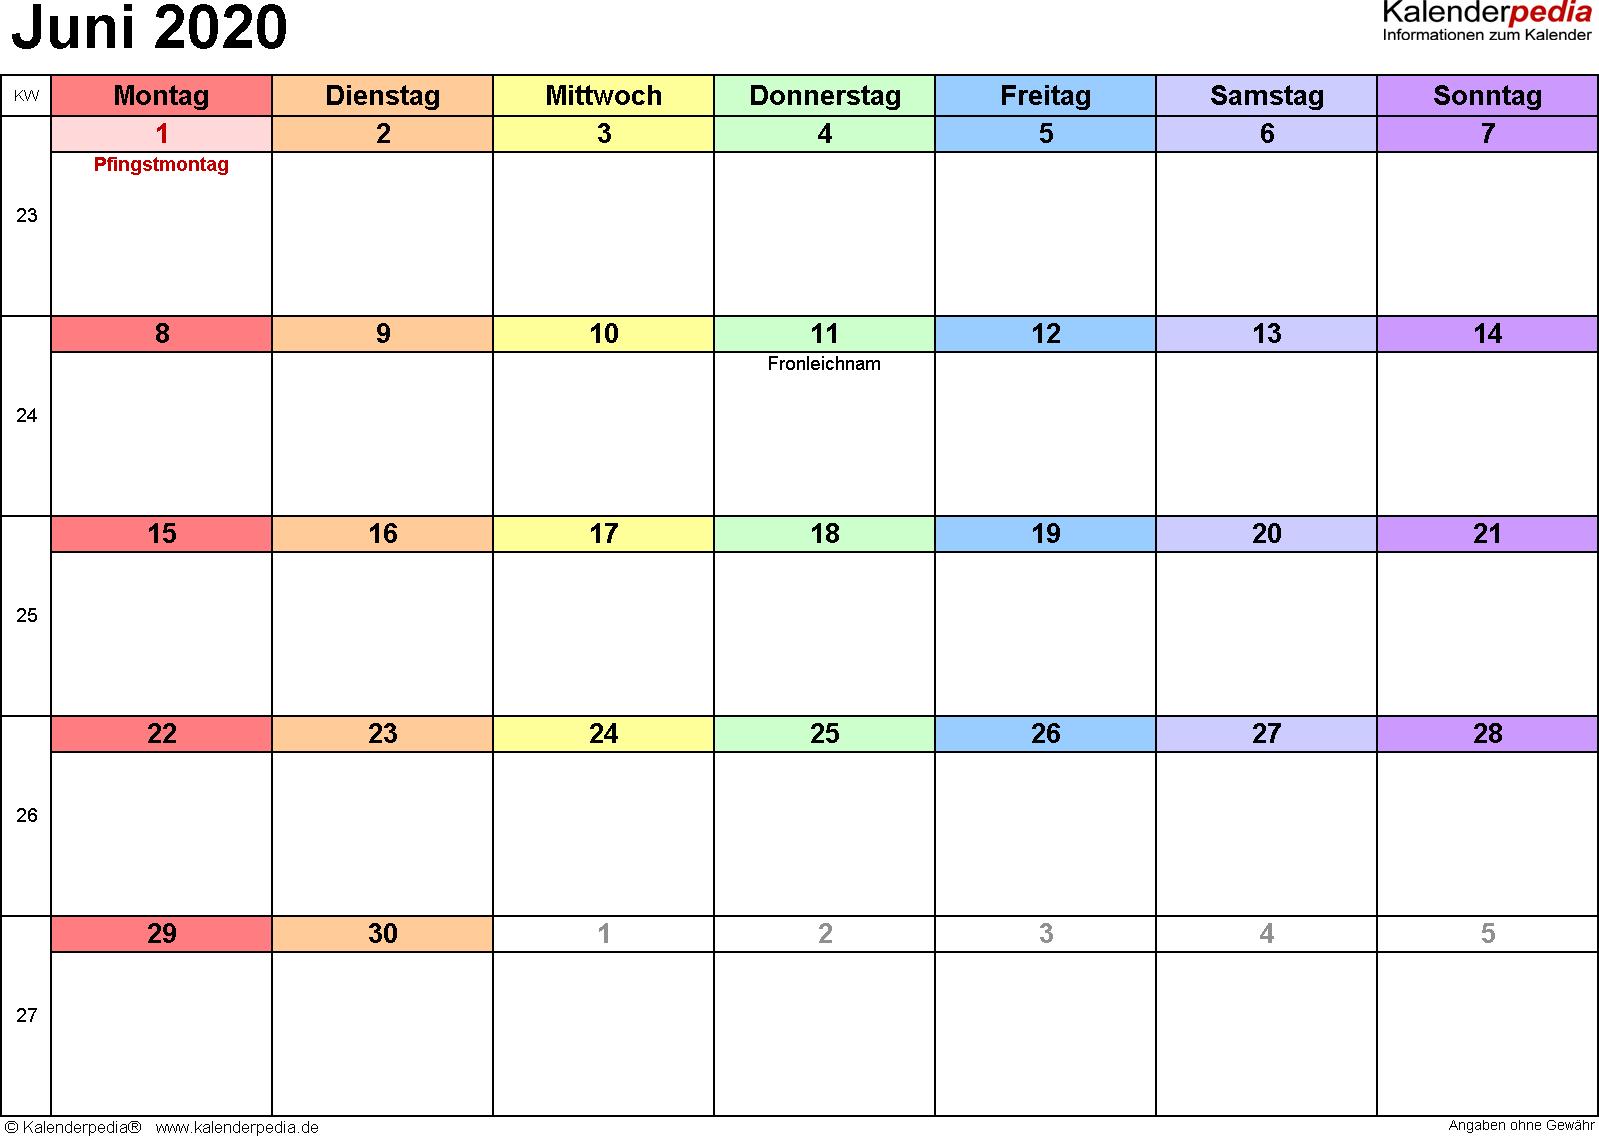 Kalender Juni 2020 (Querformat) als Excel-Vorlage